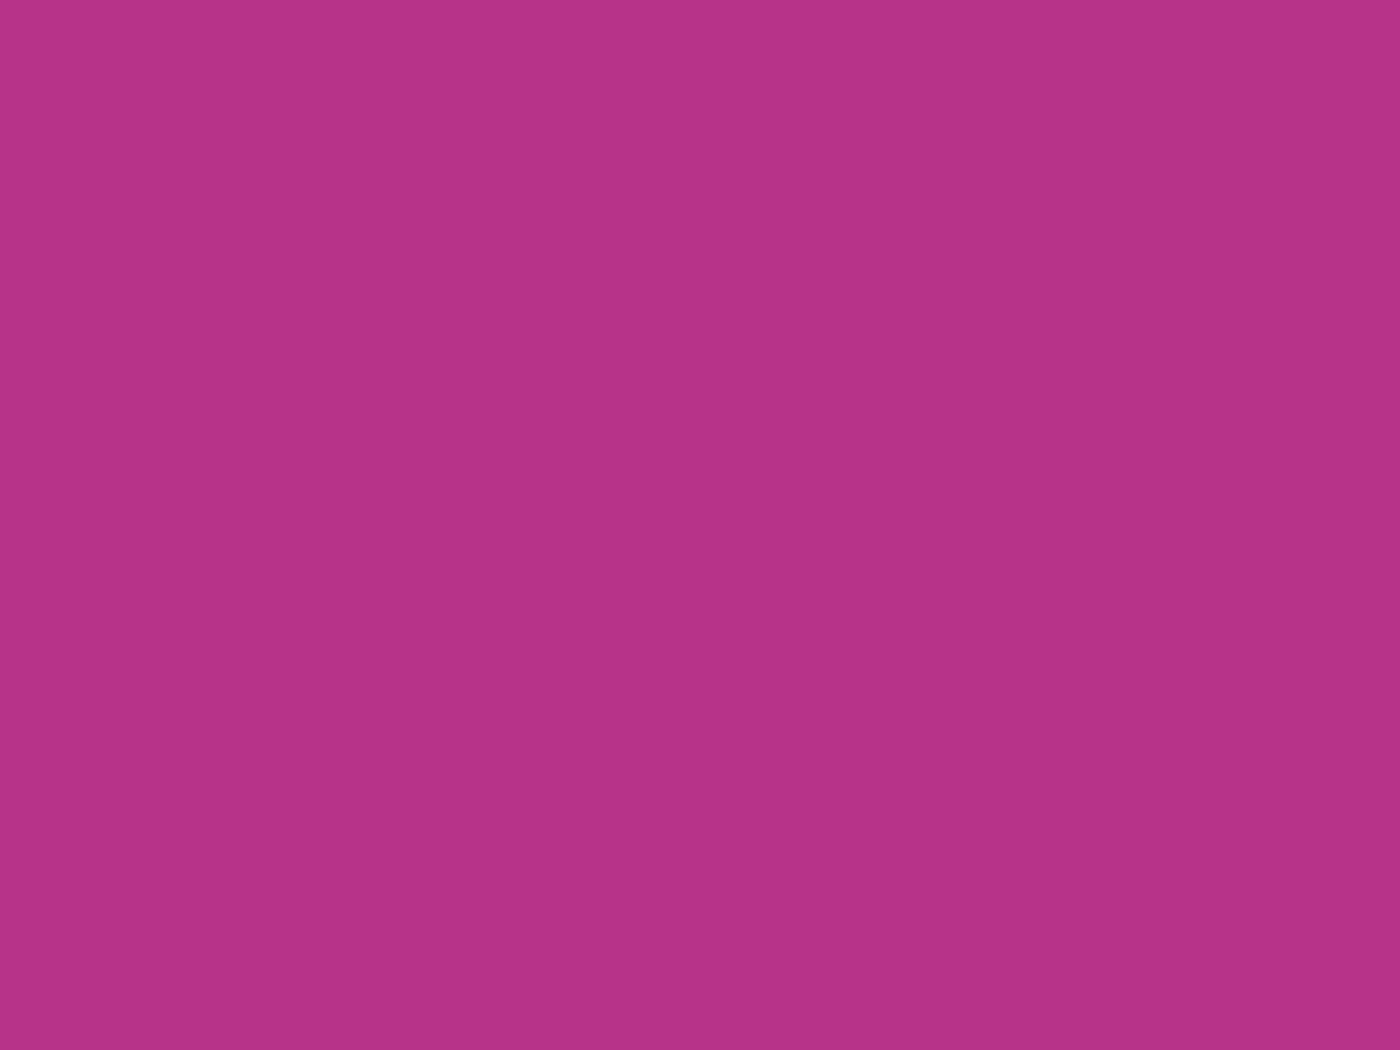 1400x1050 Fandango Solid Color Background